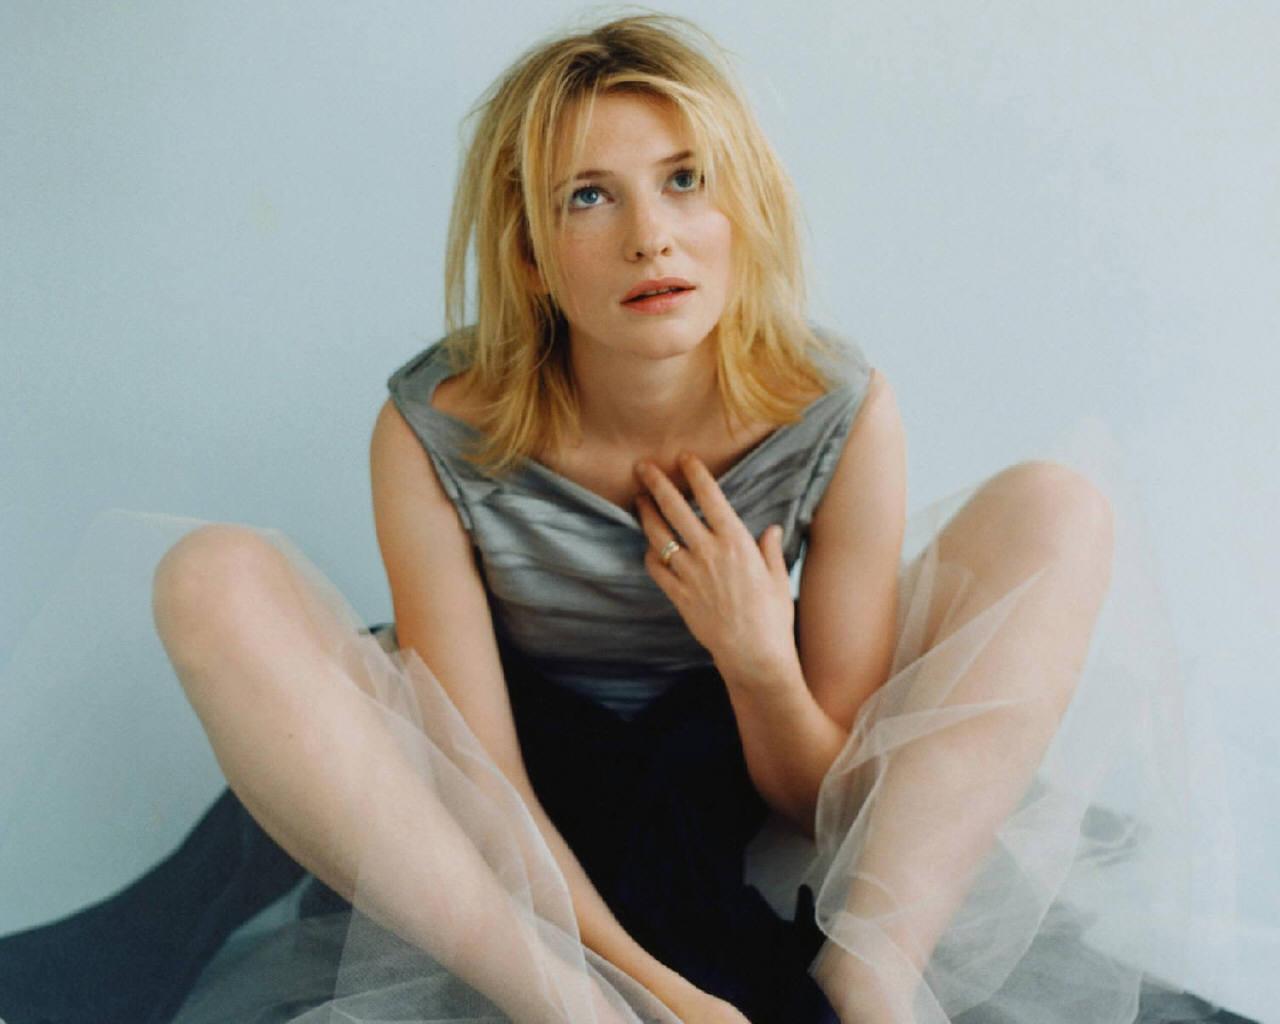 Cate Blanchett - Cate Blanchett Wallpaper (222497) - Fanpop Cate Blanchett